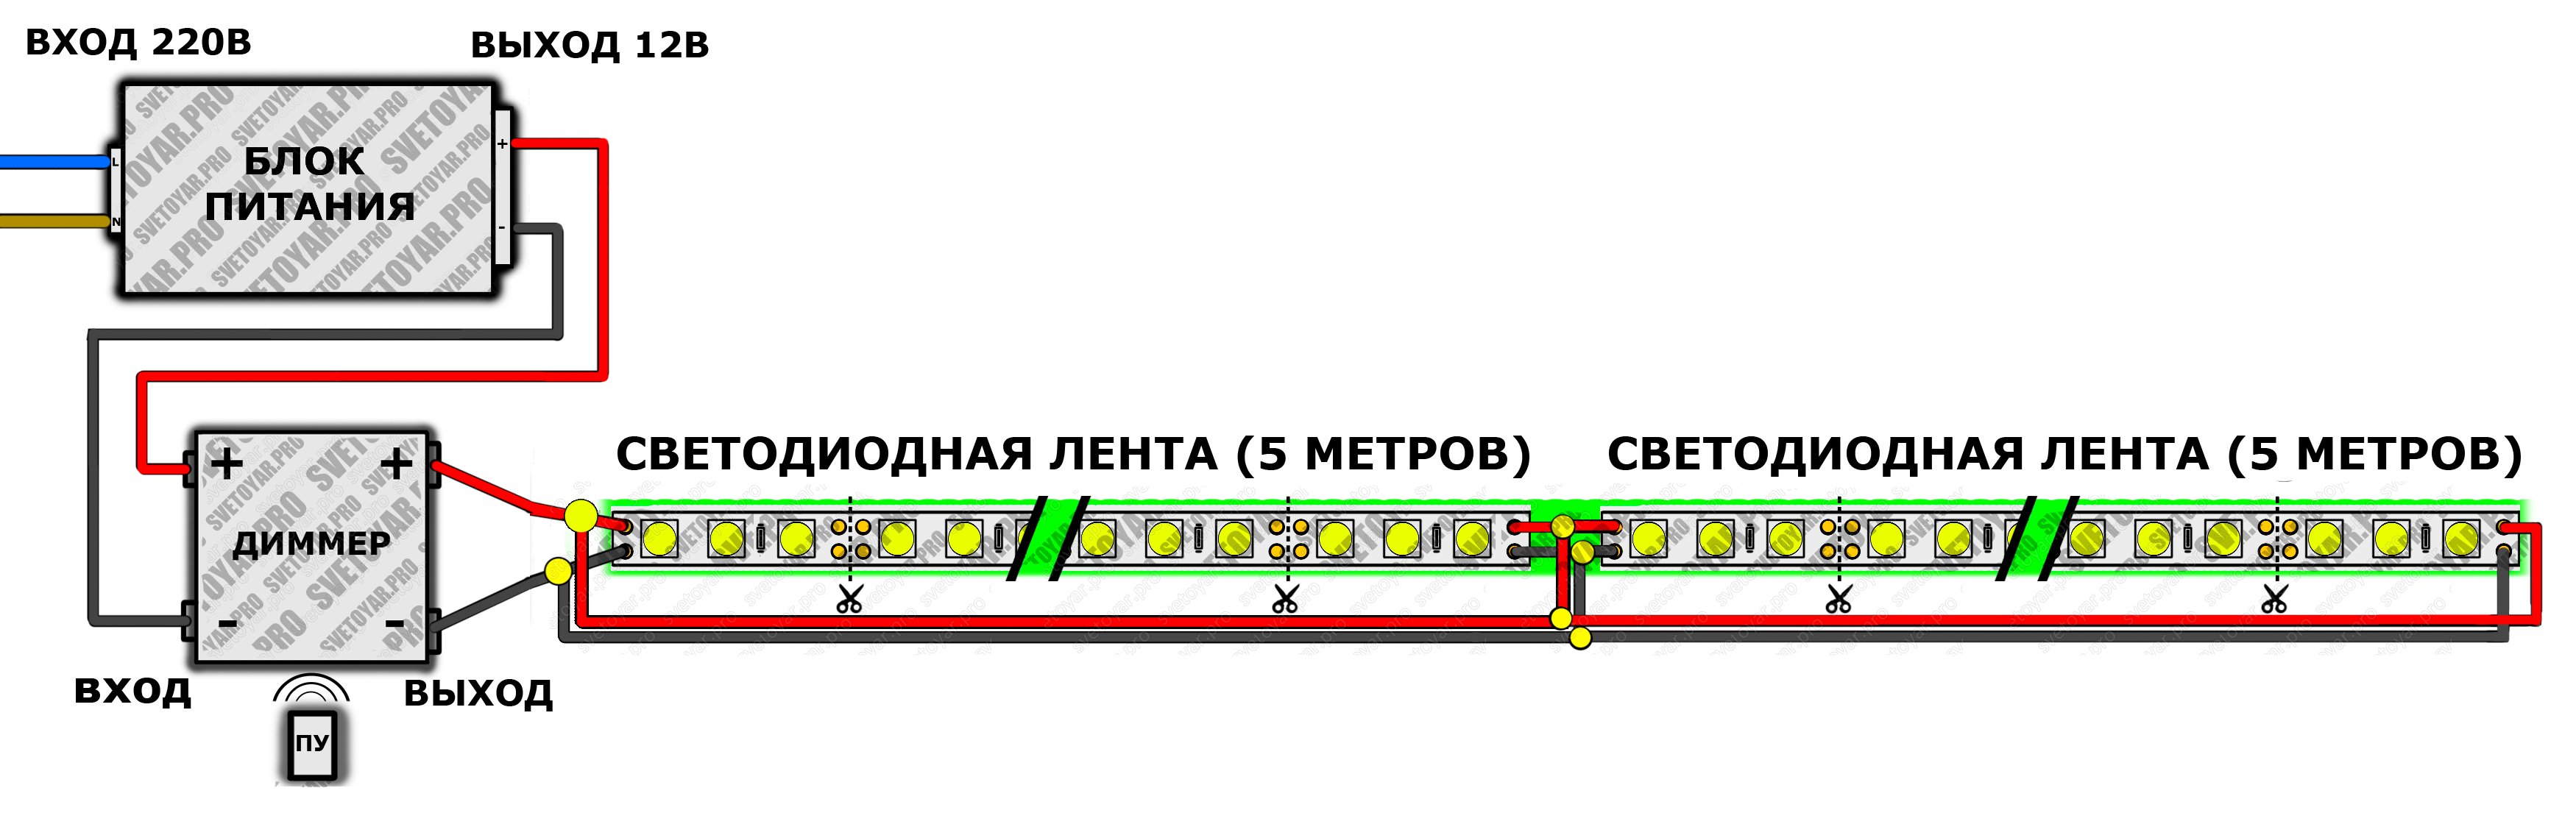 Схема подключения led светильников фото 197